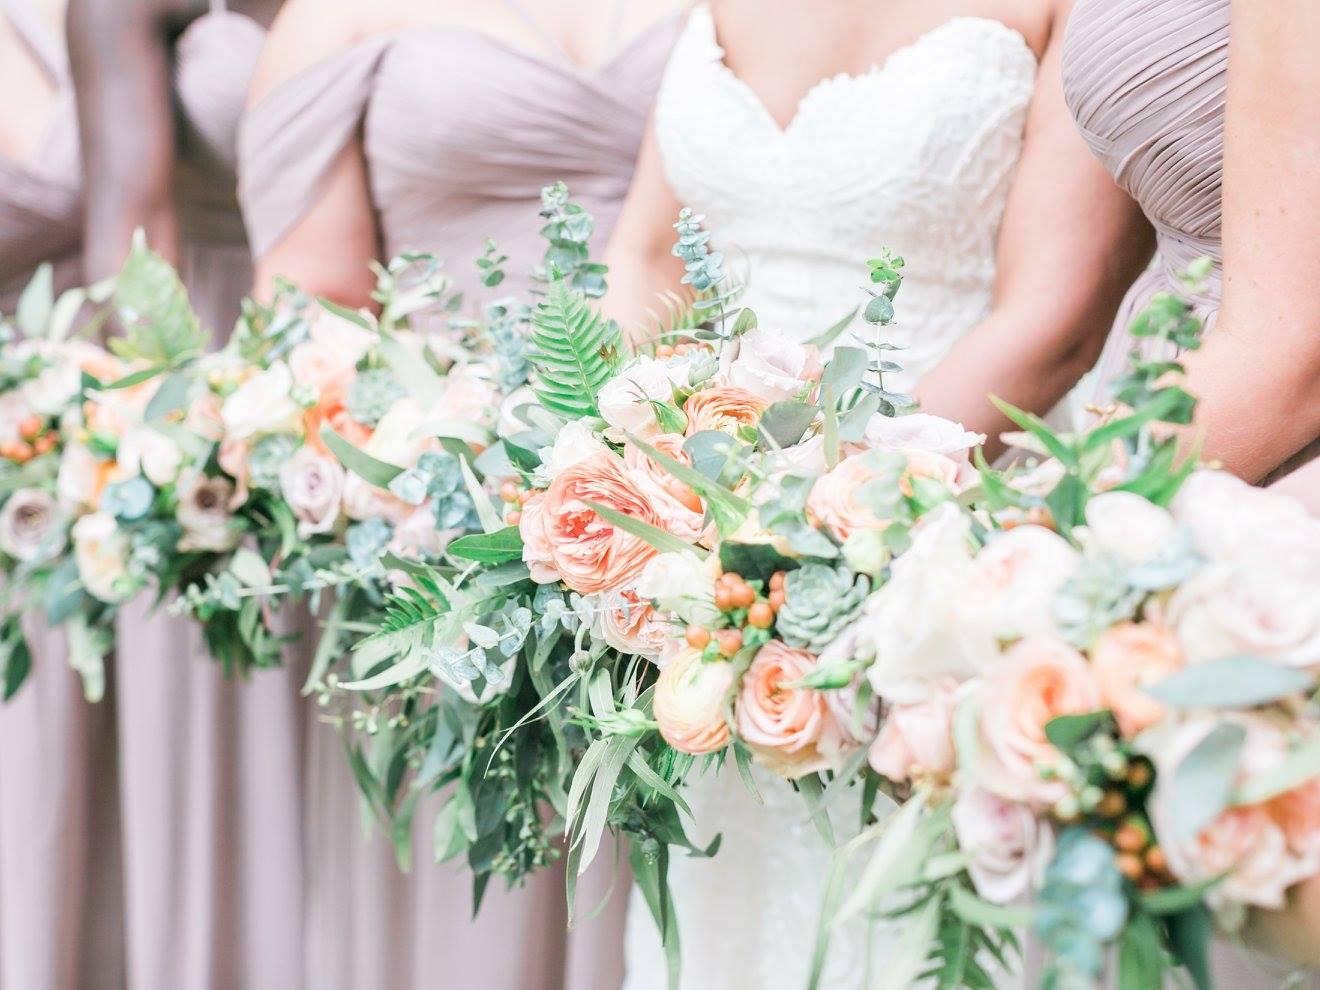 tess bouquets.jpg